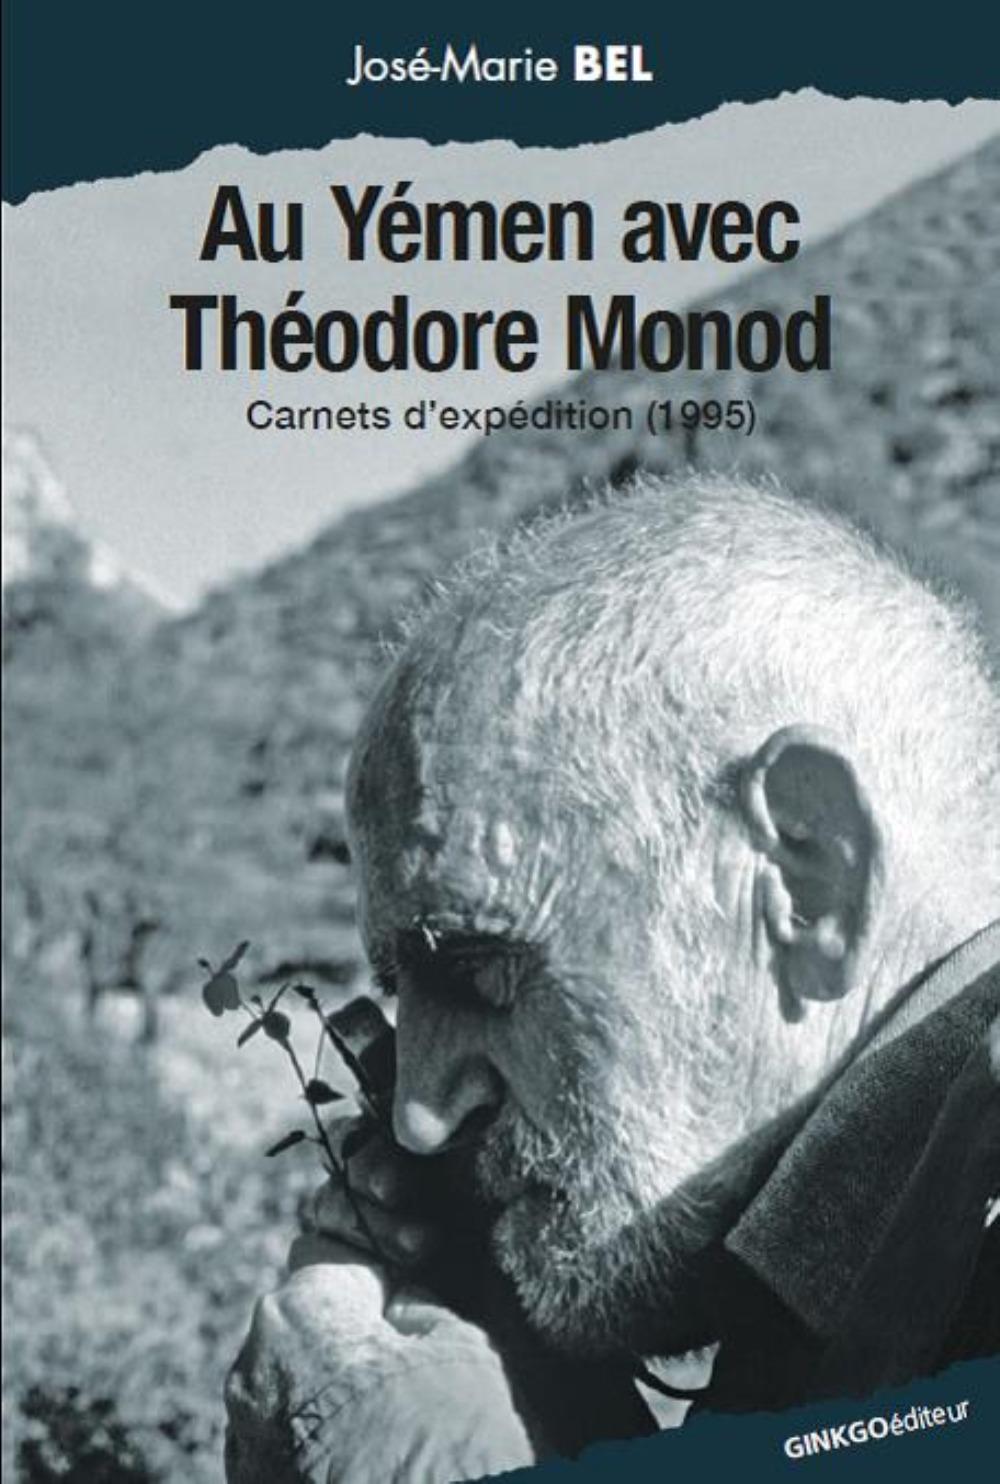 AU YEMEN AVEC THEODORE MONOD